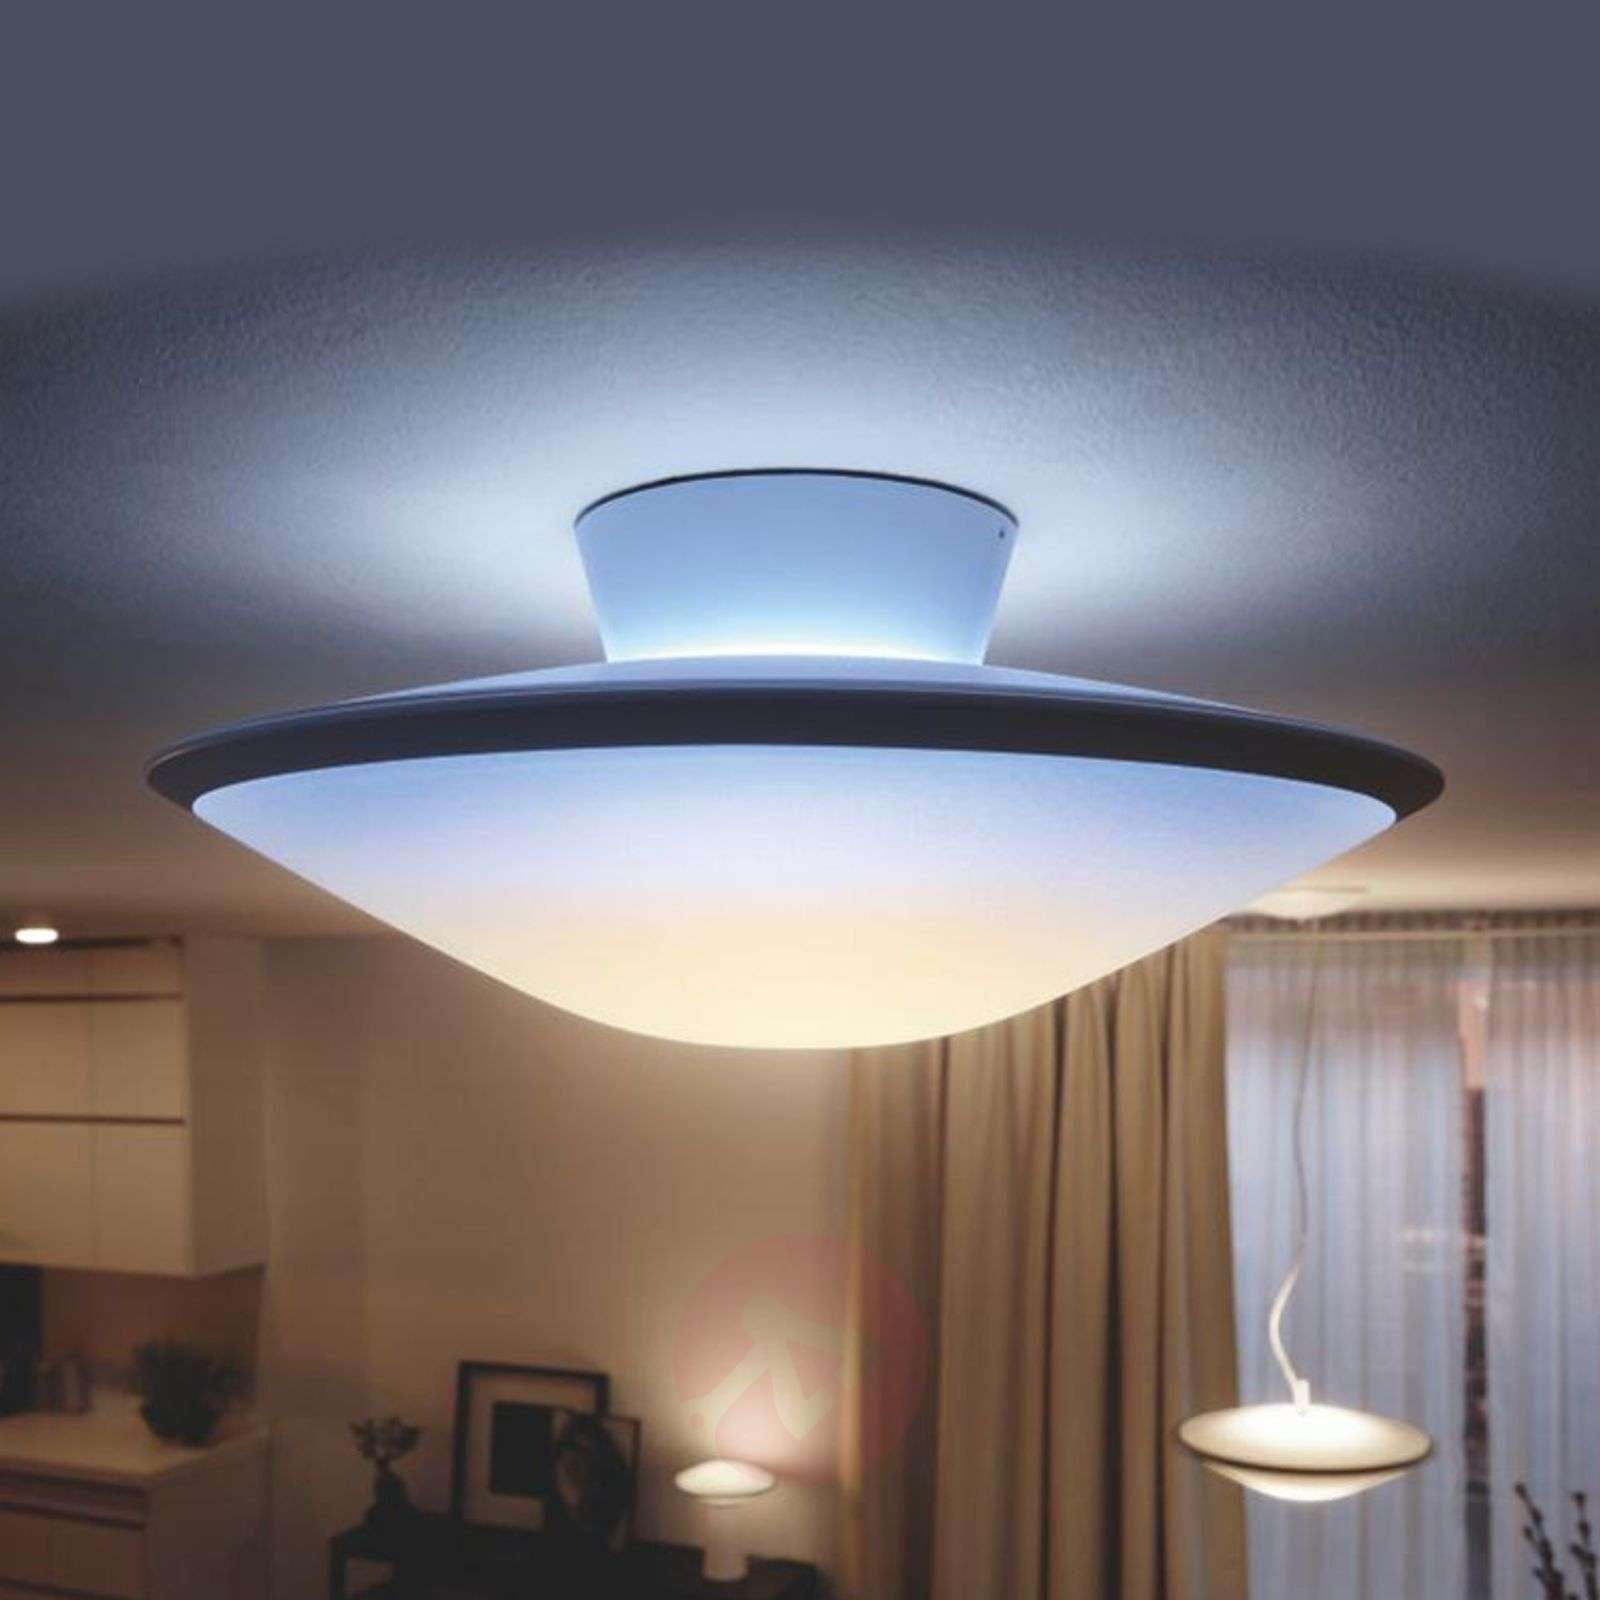 Led Ceiling Light Philips Hue Phoenix Lights Ie